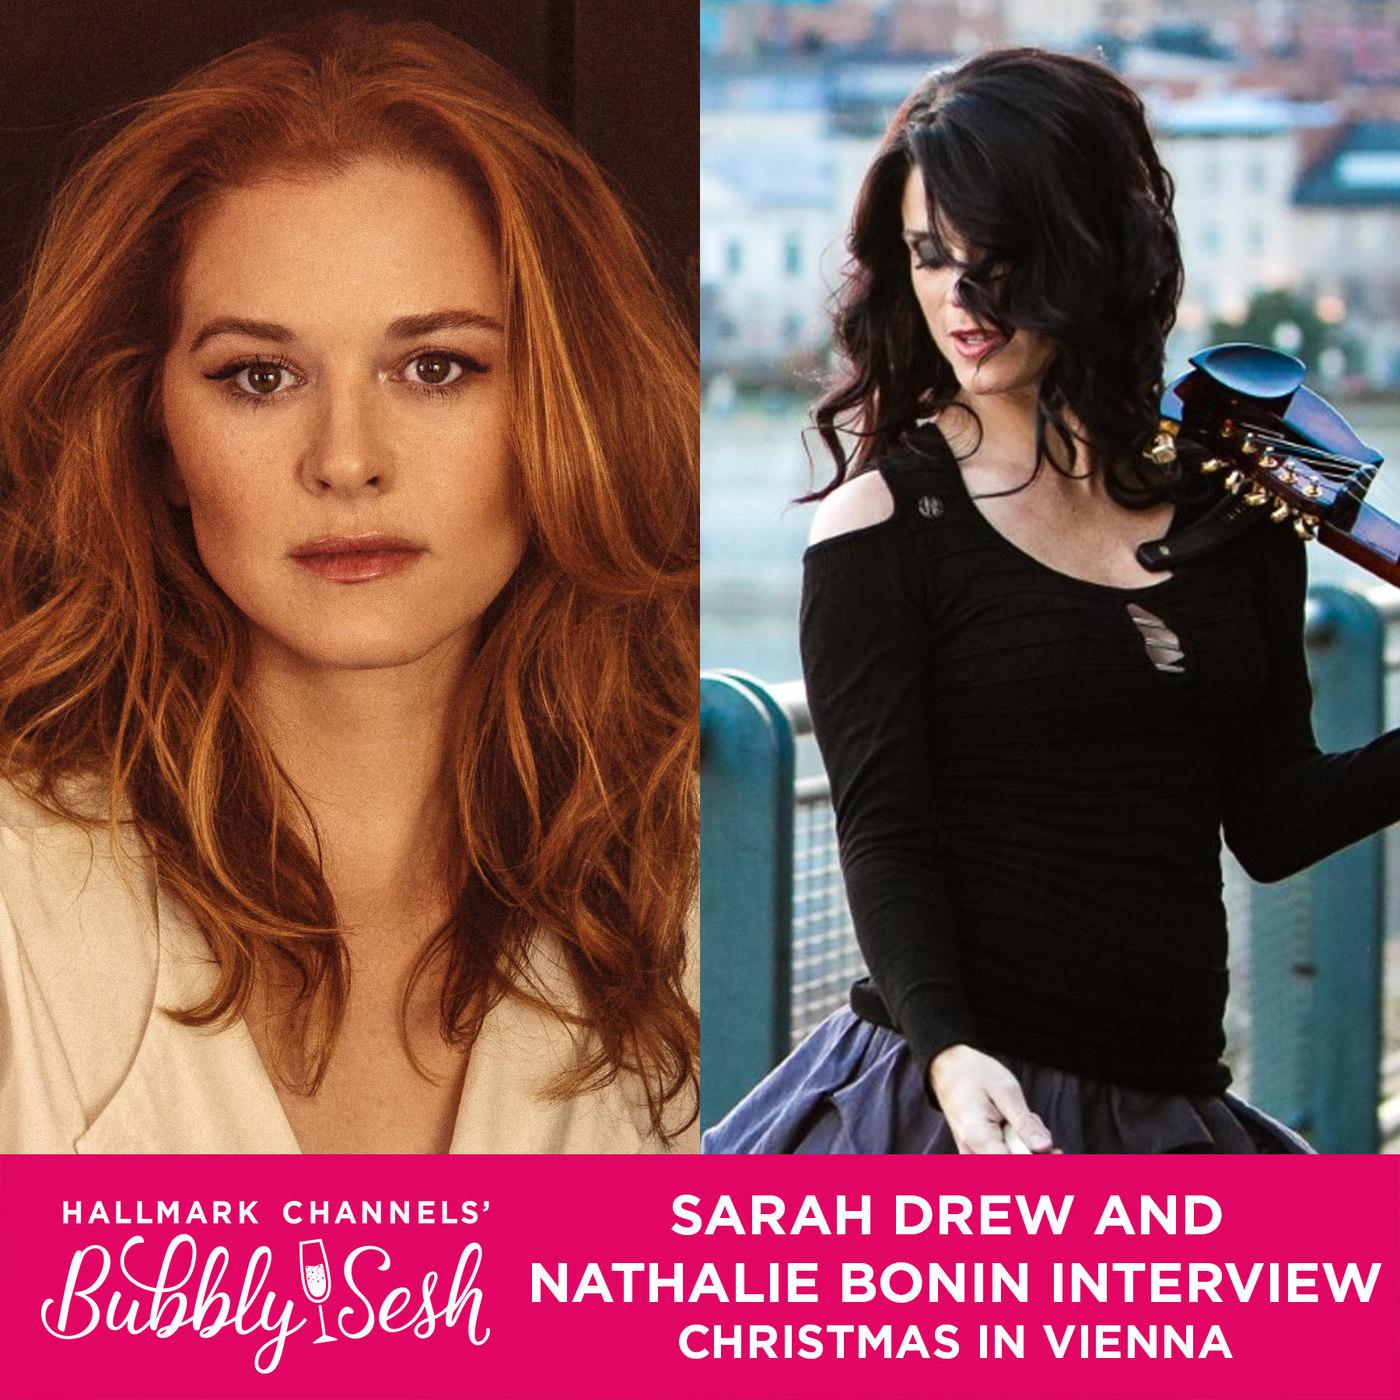 Sarah Drew and Nathalie Bonin Interview, Christmas in Vienna